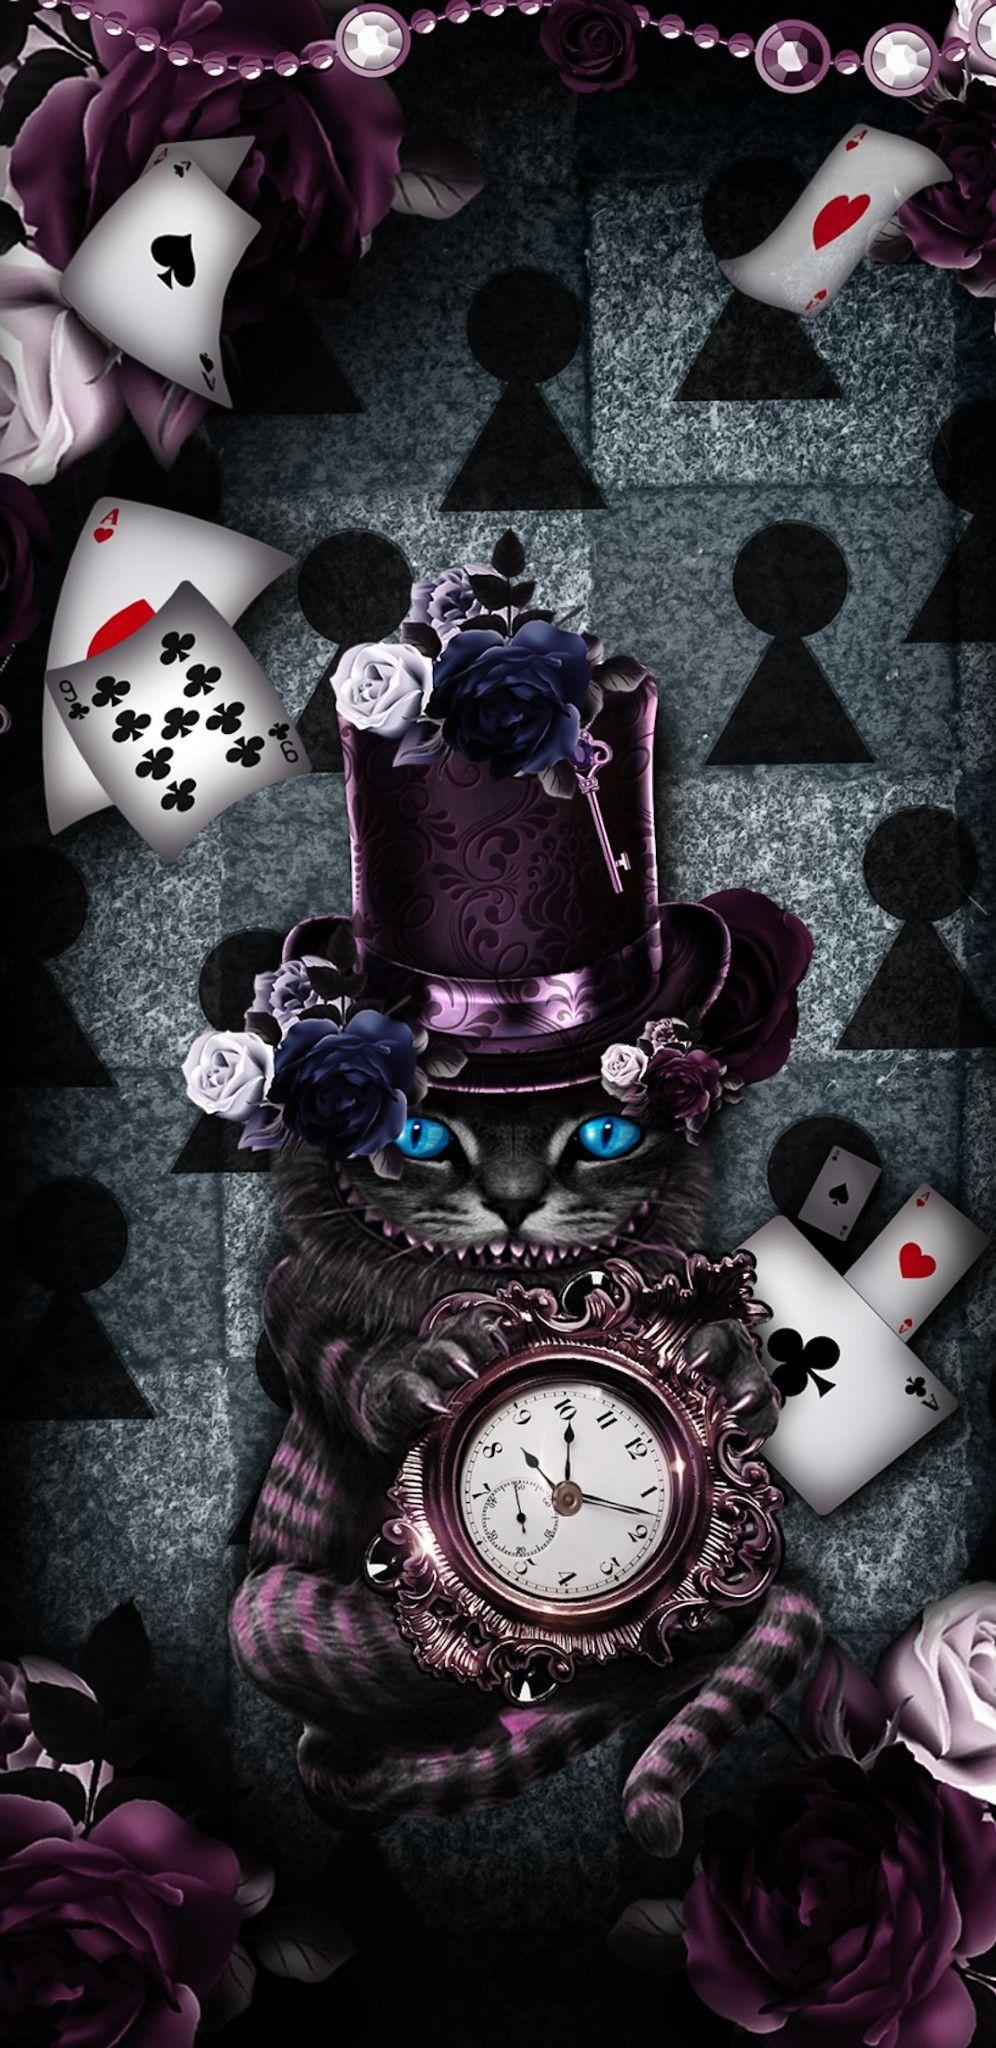 Wallpaper Lockscreen Iphone Android Cellphone Wallpaper Backgrounds Cheshire Cat Wallpaper Dark Alice In Wonderland